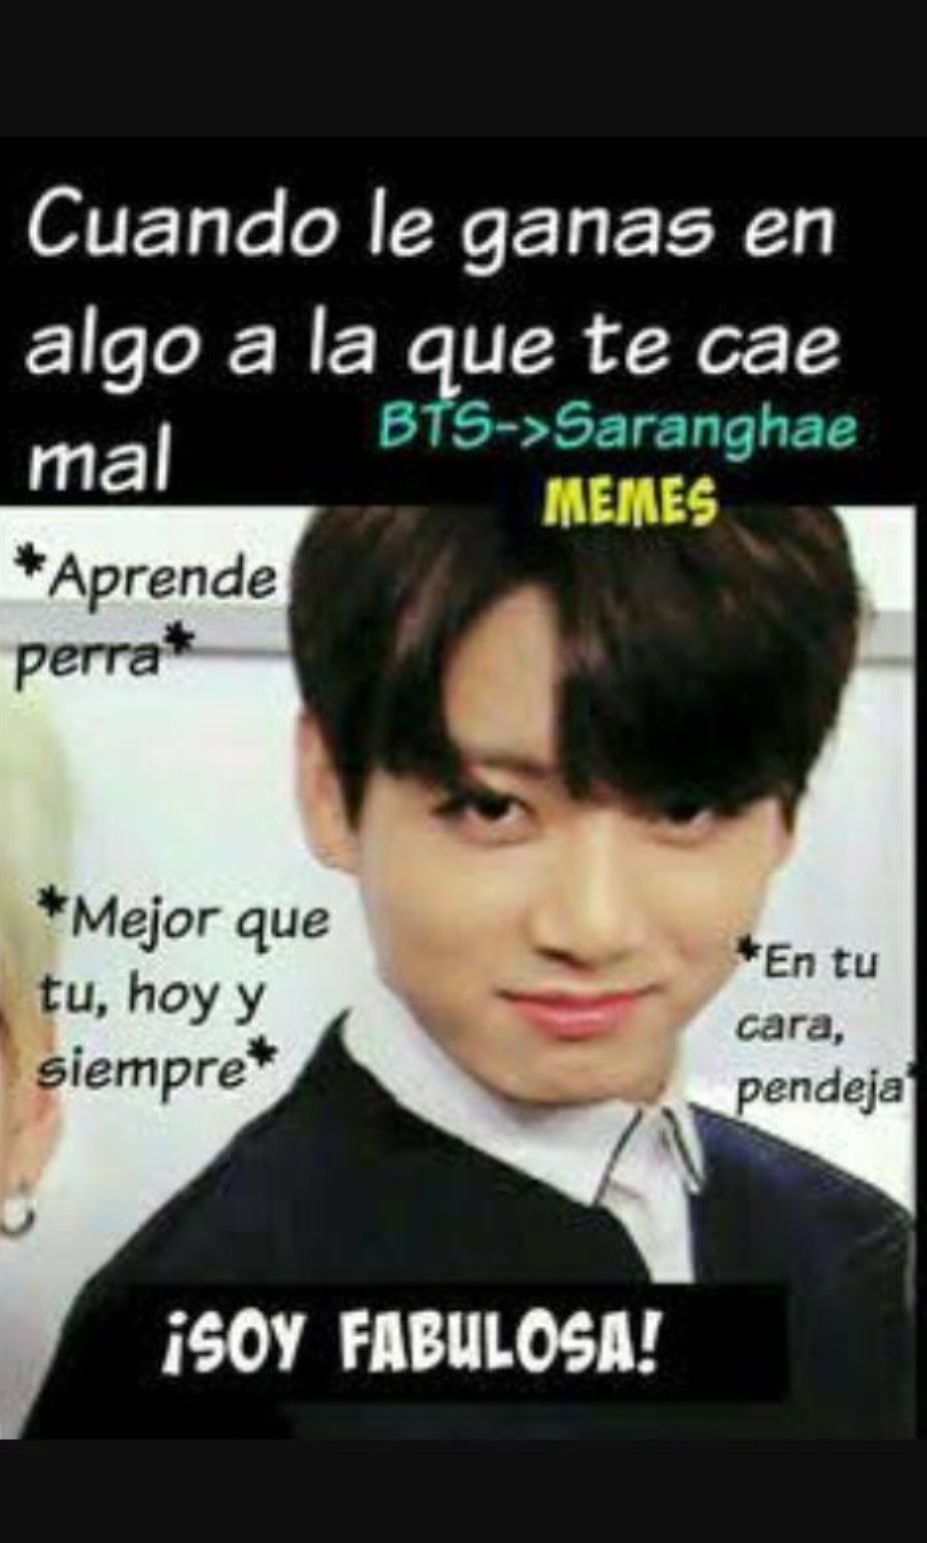 Pin By Steph 94 On Bts Spanish Memes Bts Memes Bts Funny Memes